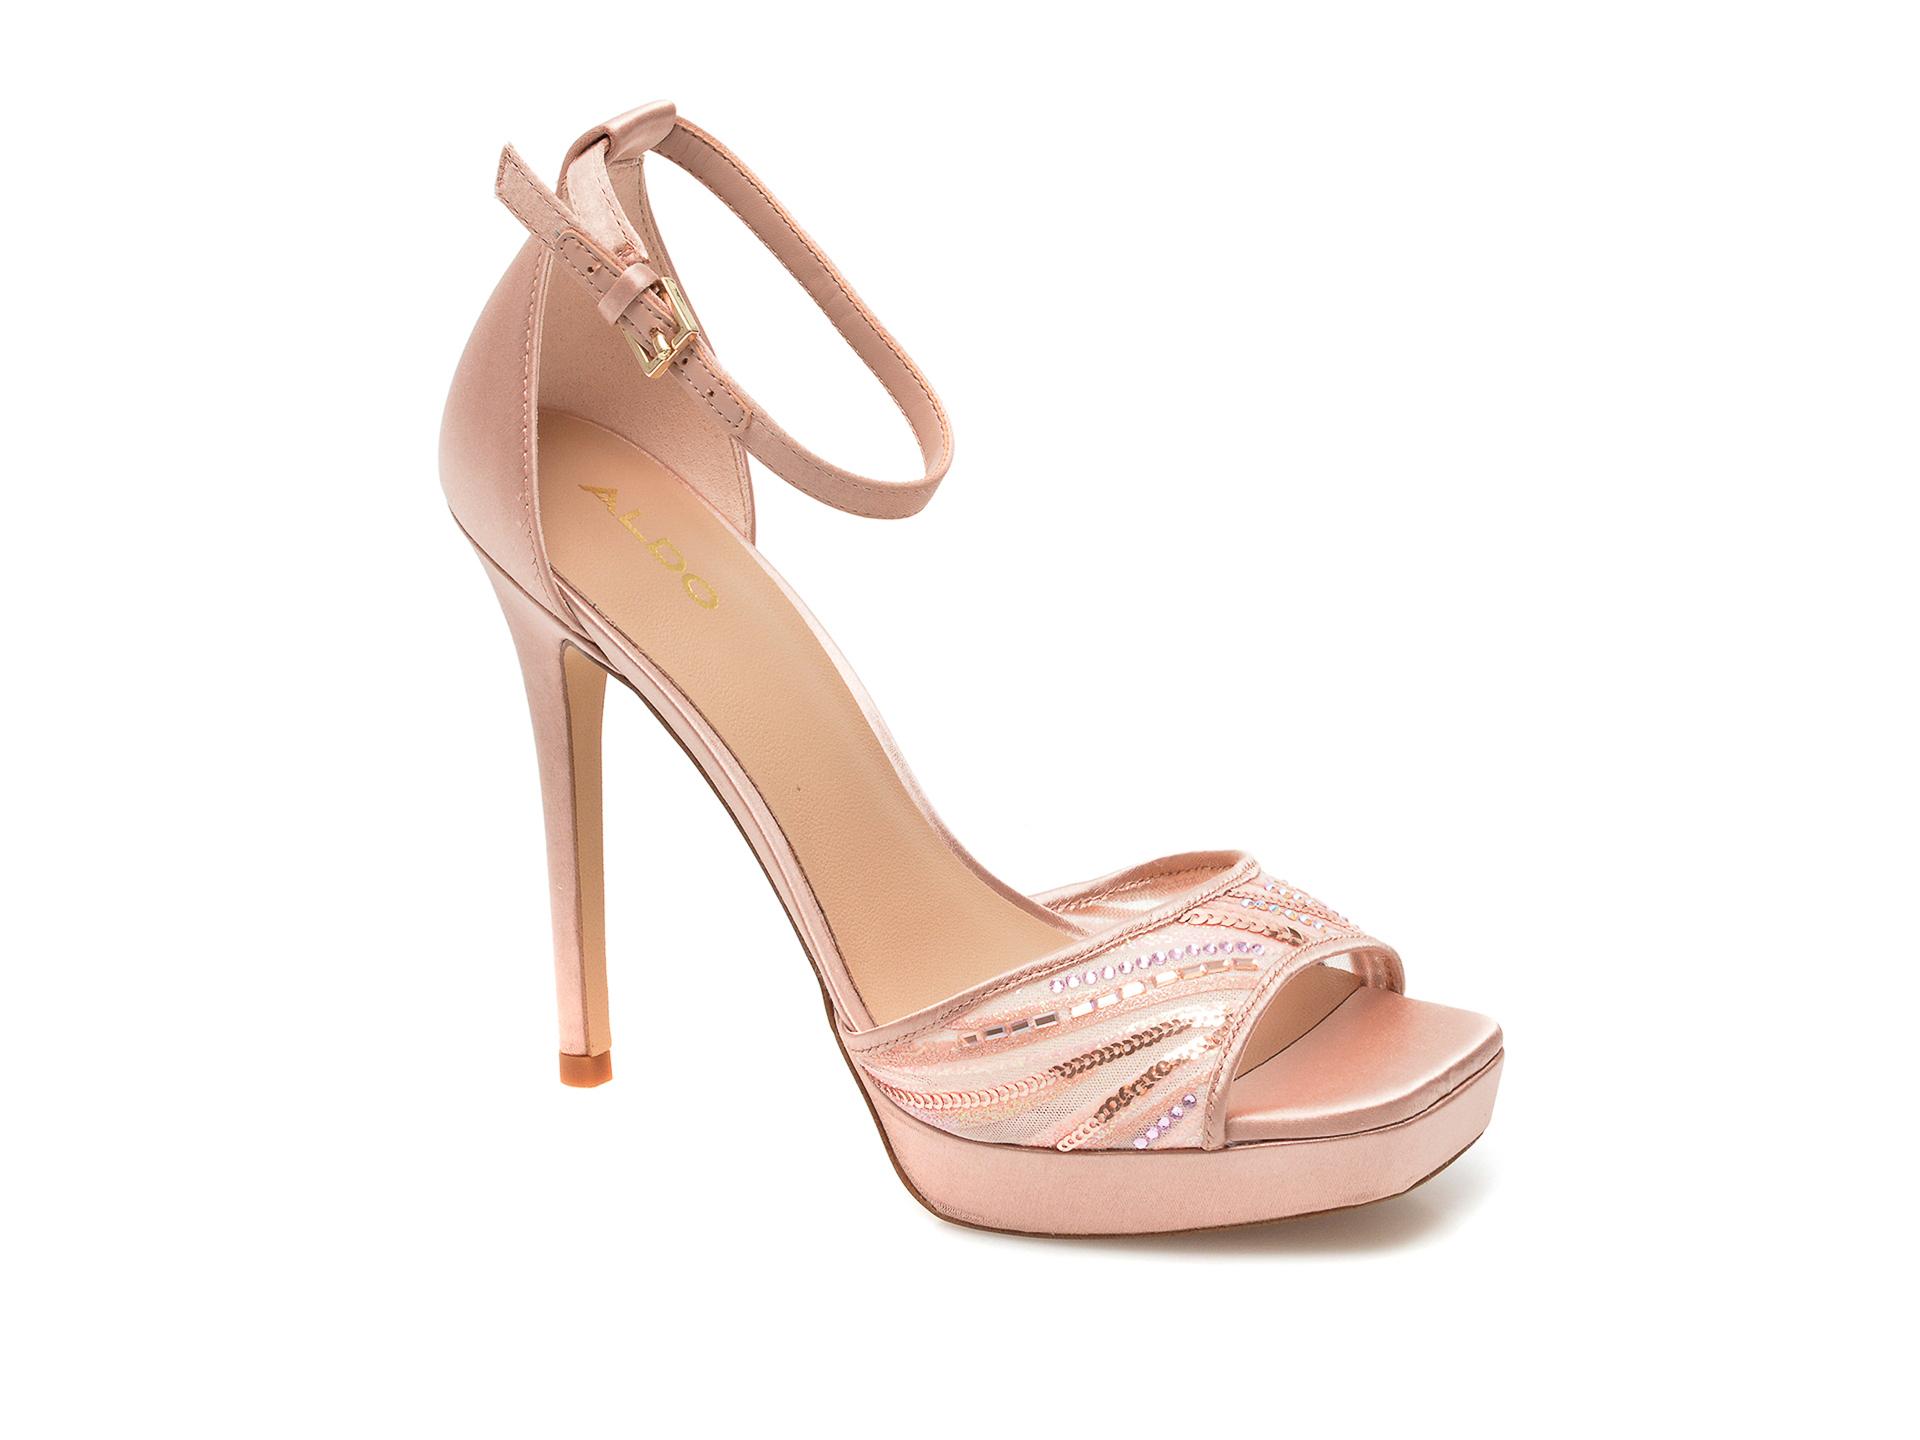 Sandale ALDO roz, 13258813, din material textil imagine otter.ro 2021